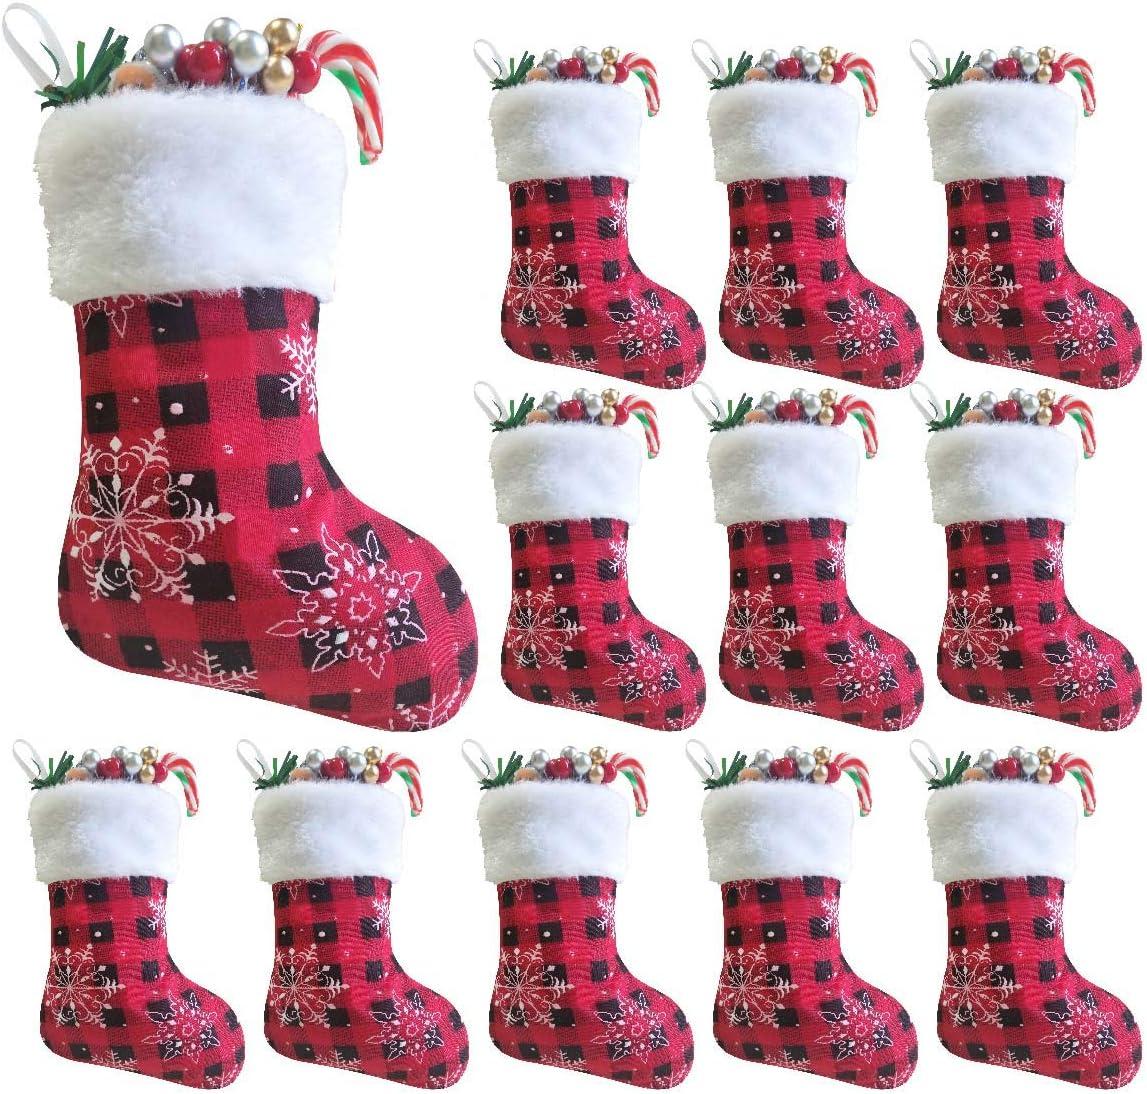 Set of 12 Miniature Red Felt Christmas Stocking Bundle